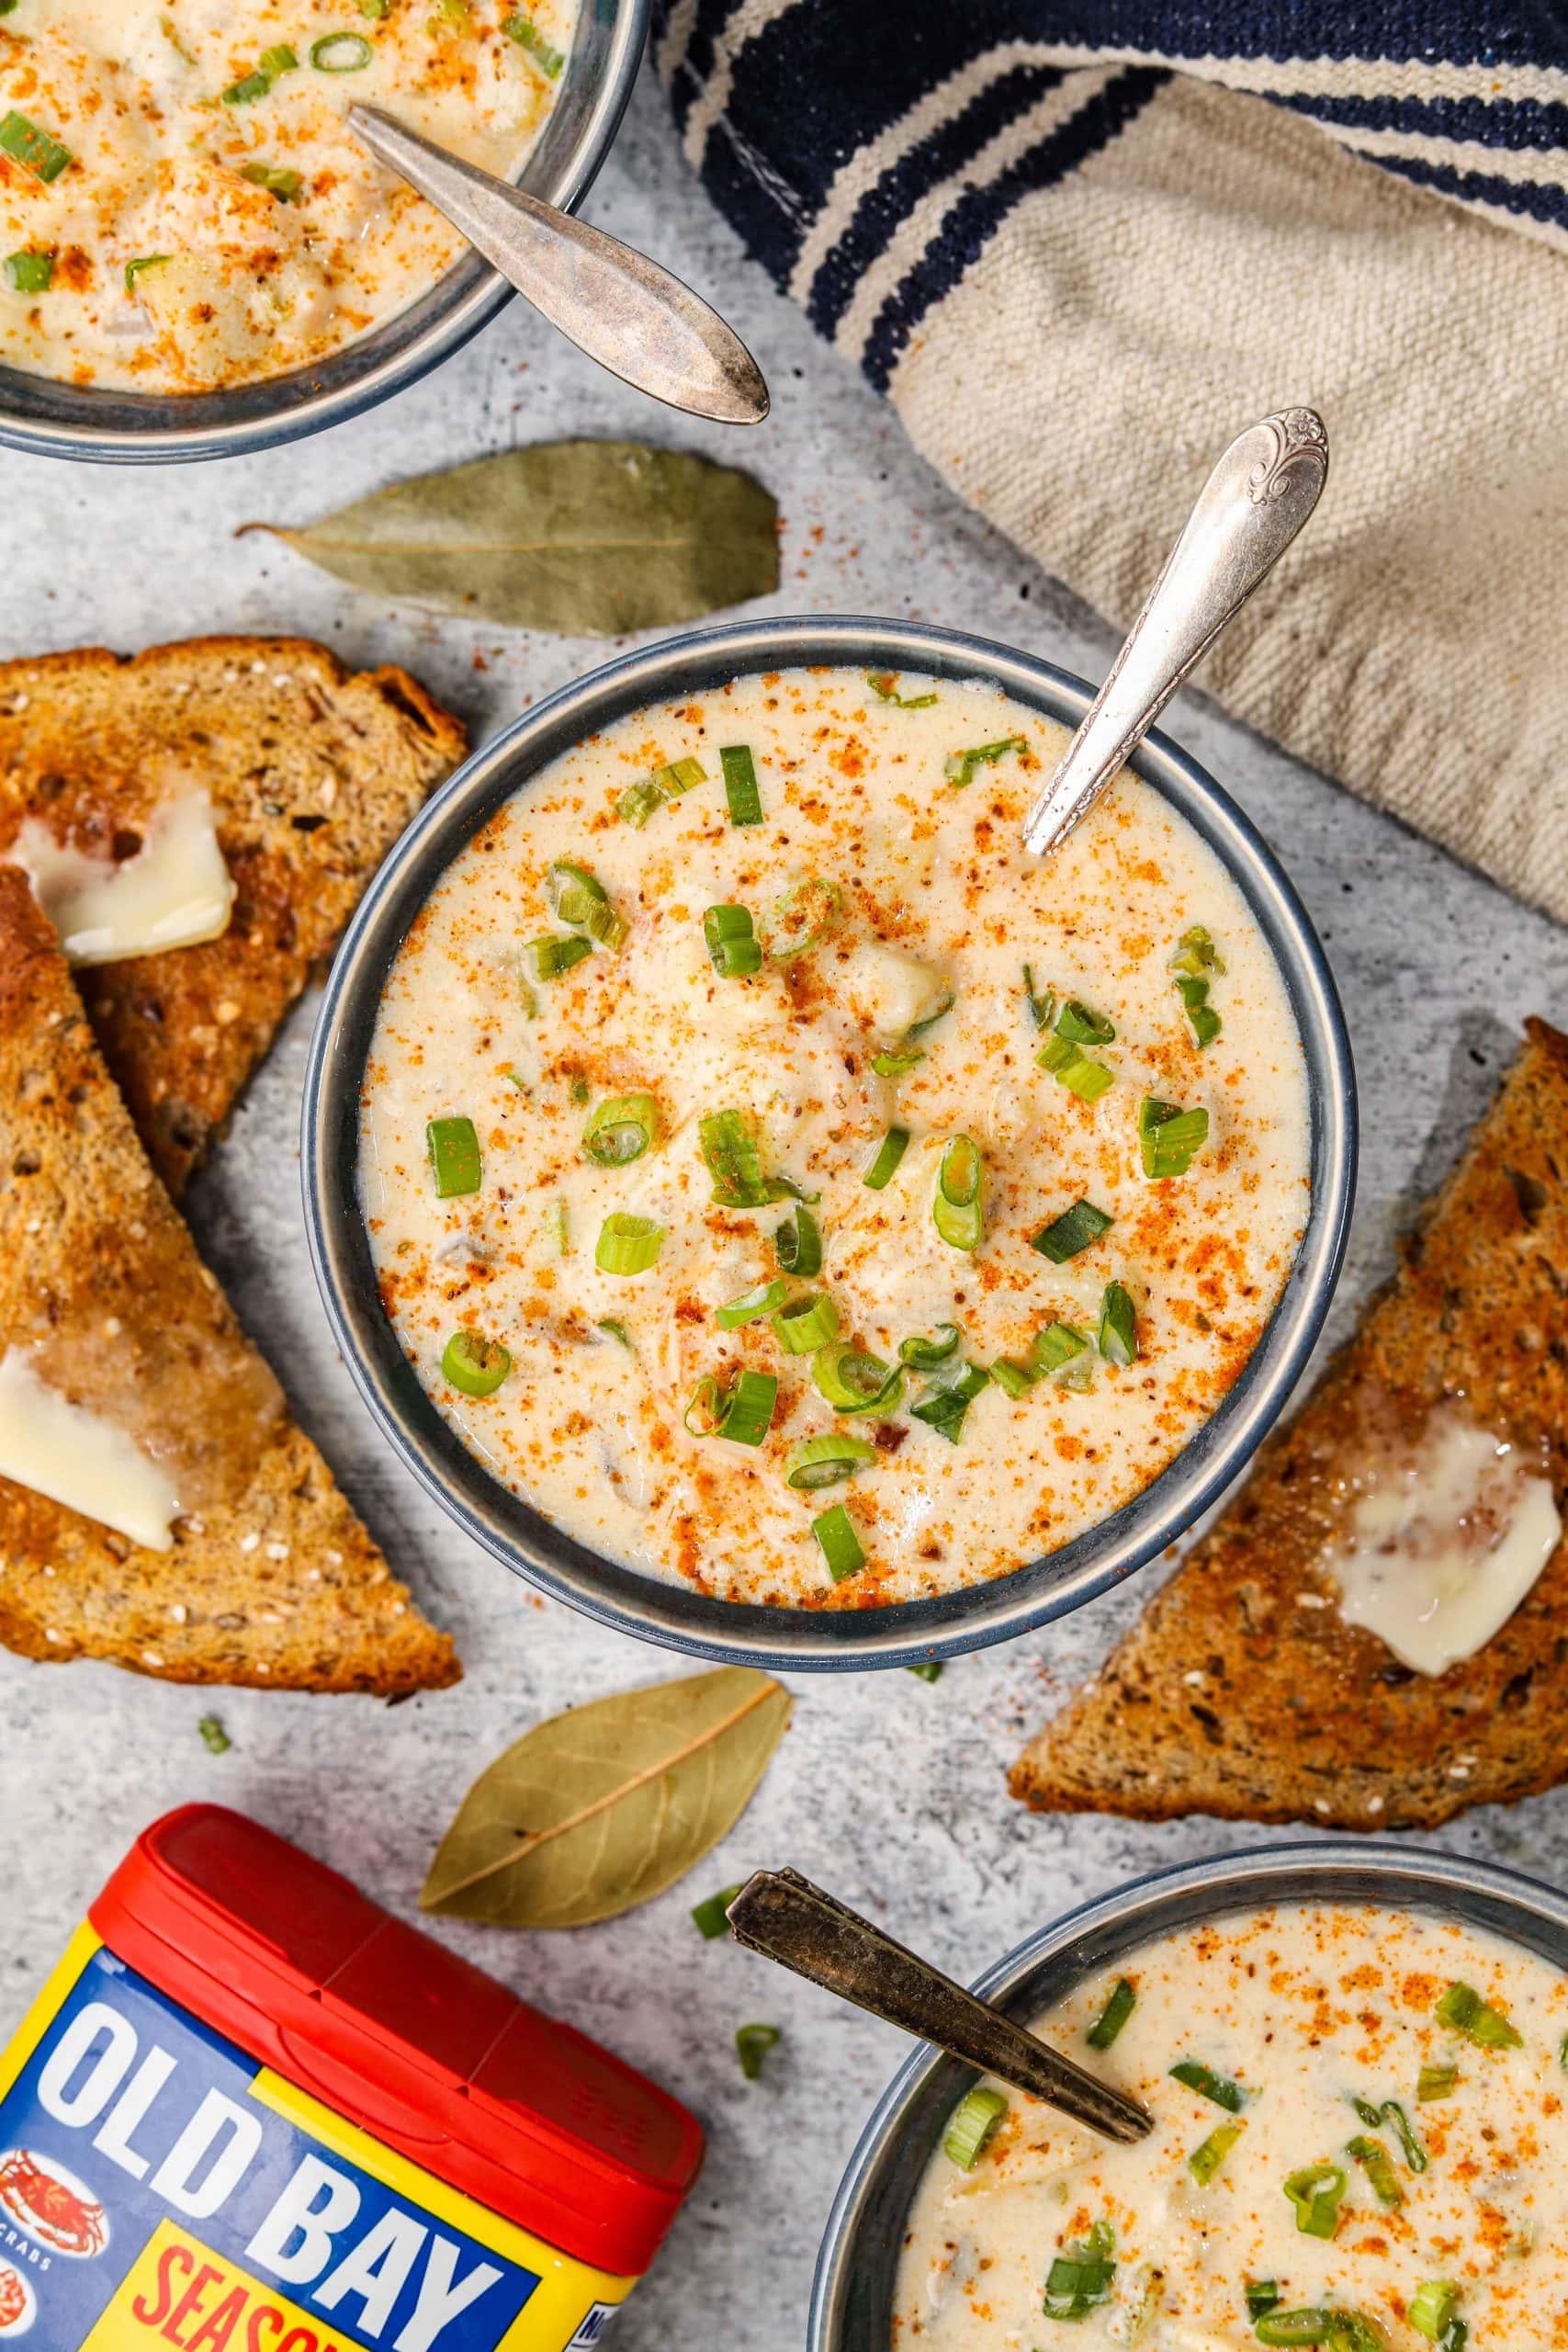 bowls of seafood newburg soup